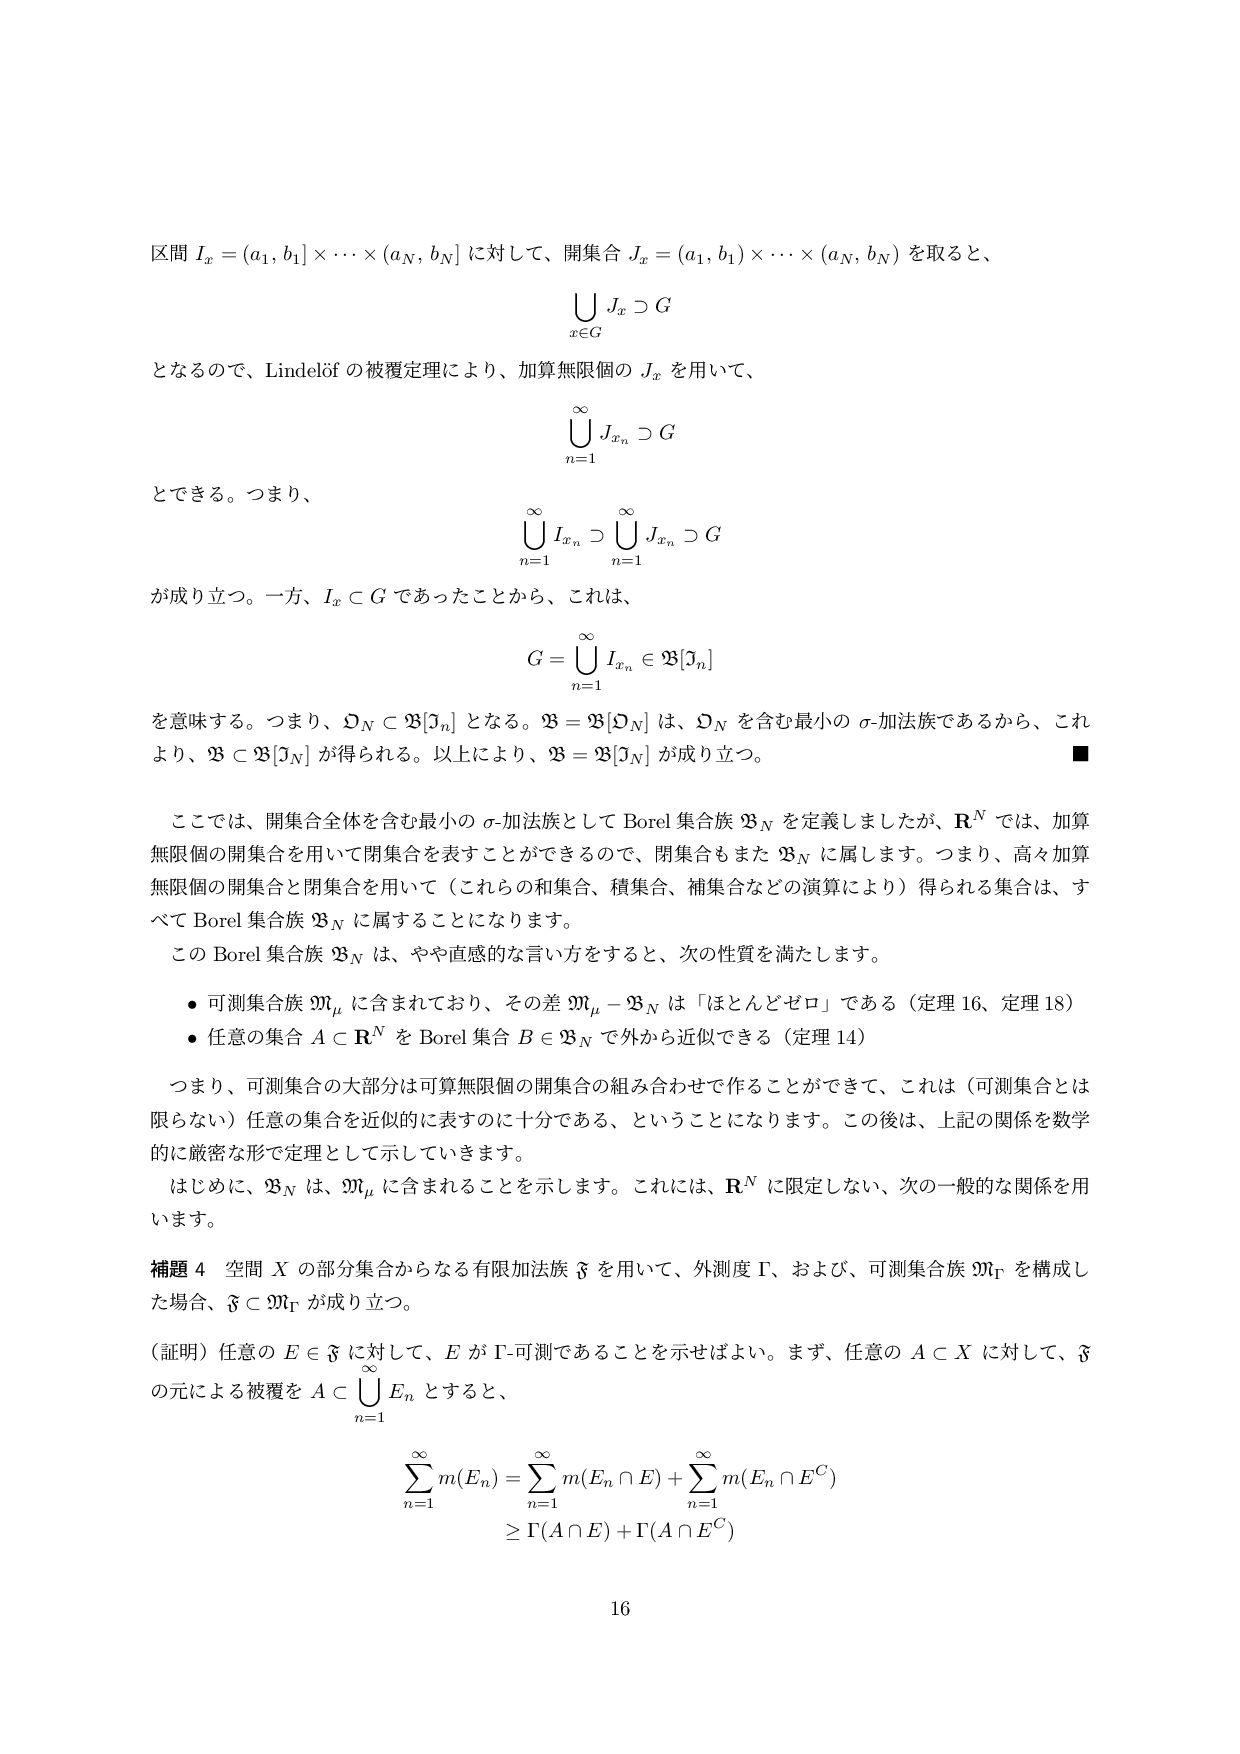 µ(A) < ∞ ͷ߹ɺఆཧ 10 ΑΓɺµ(A) + ϵ < µ(G) Λຬͨ͢։ू߹ ...